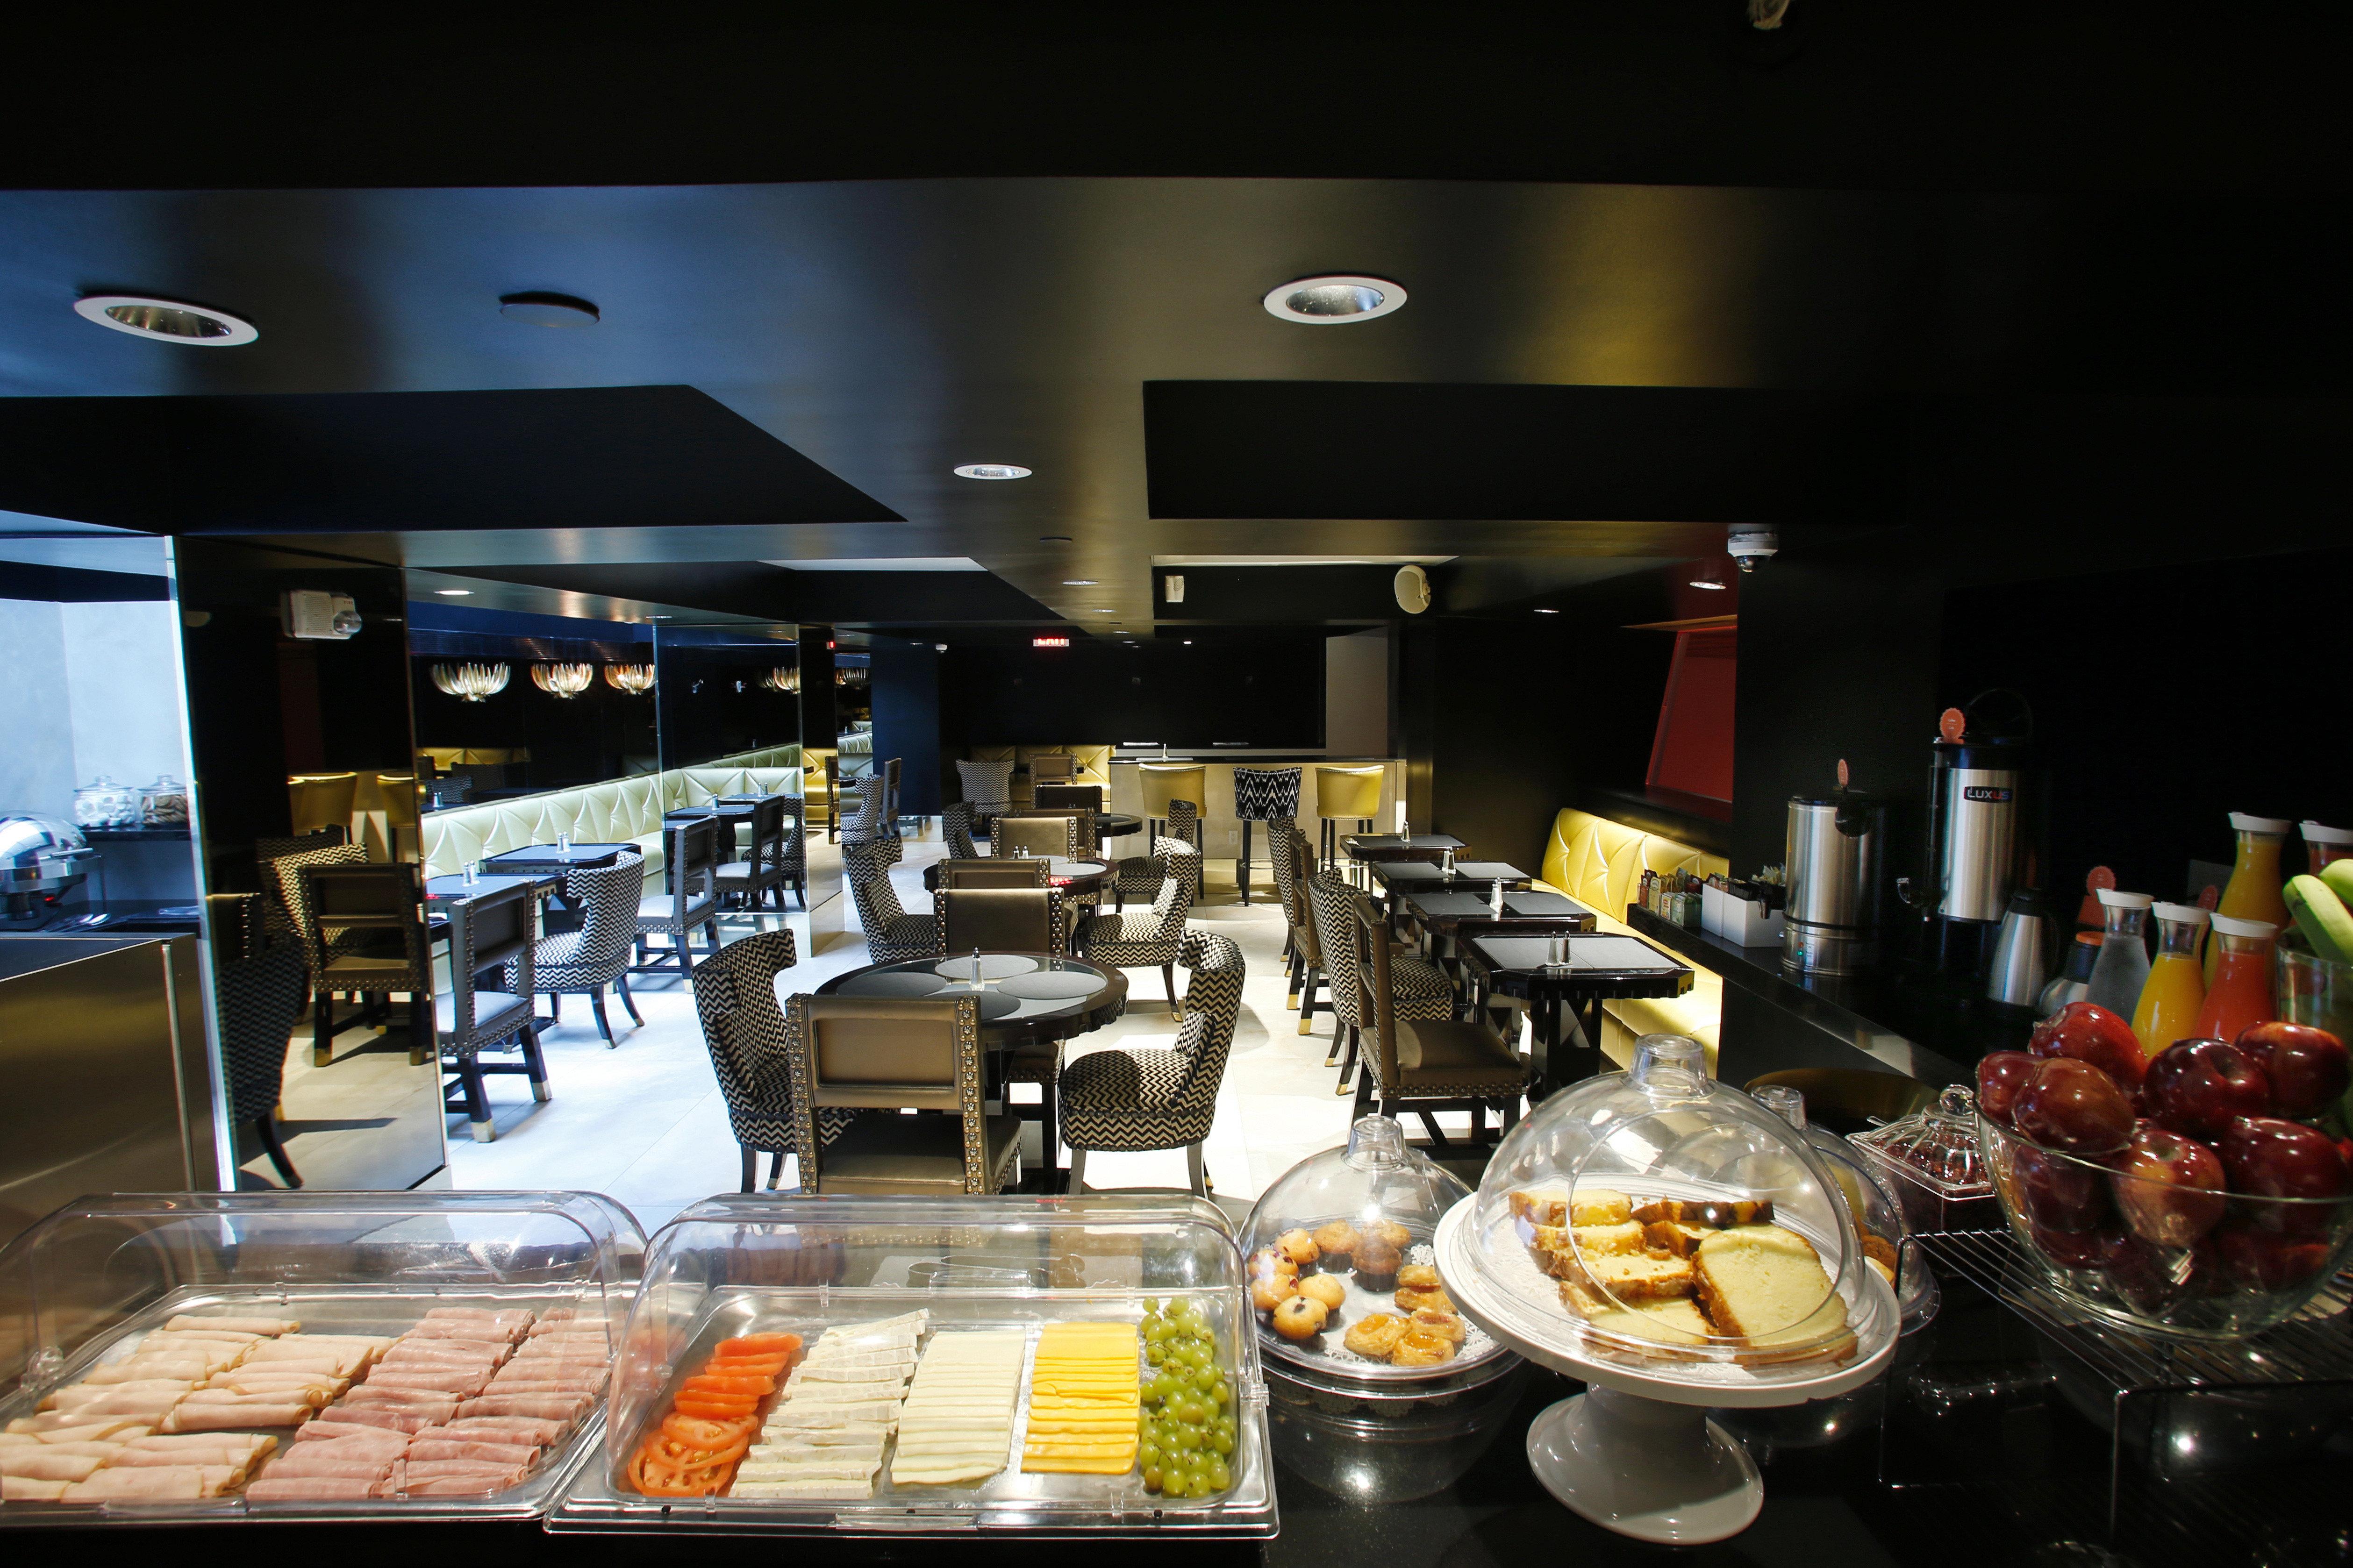 Boutique Budget City Dining Eat Hip Modern restaurant buffet food cuisine counter Bar dining table